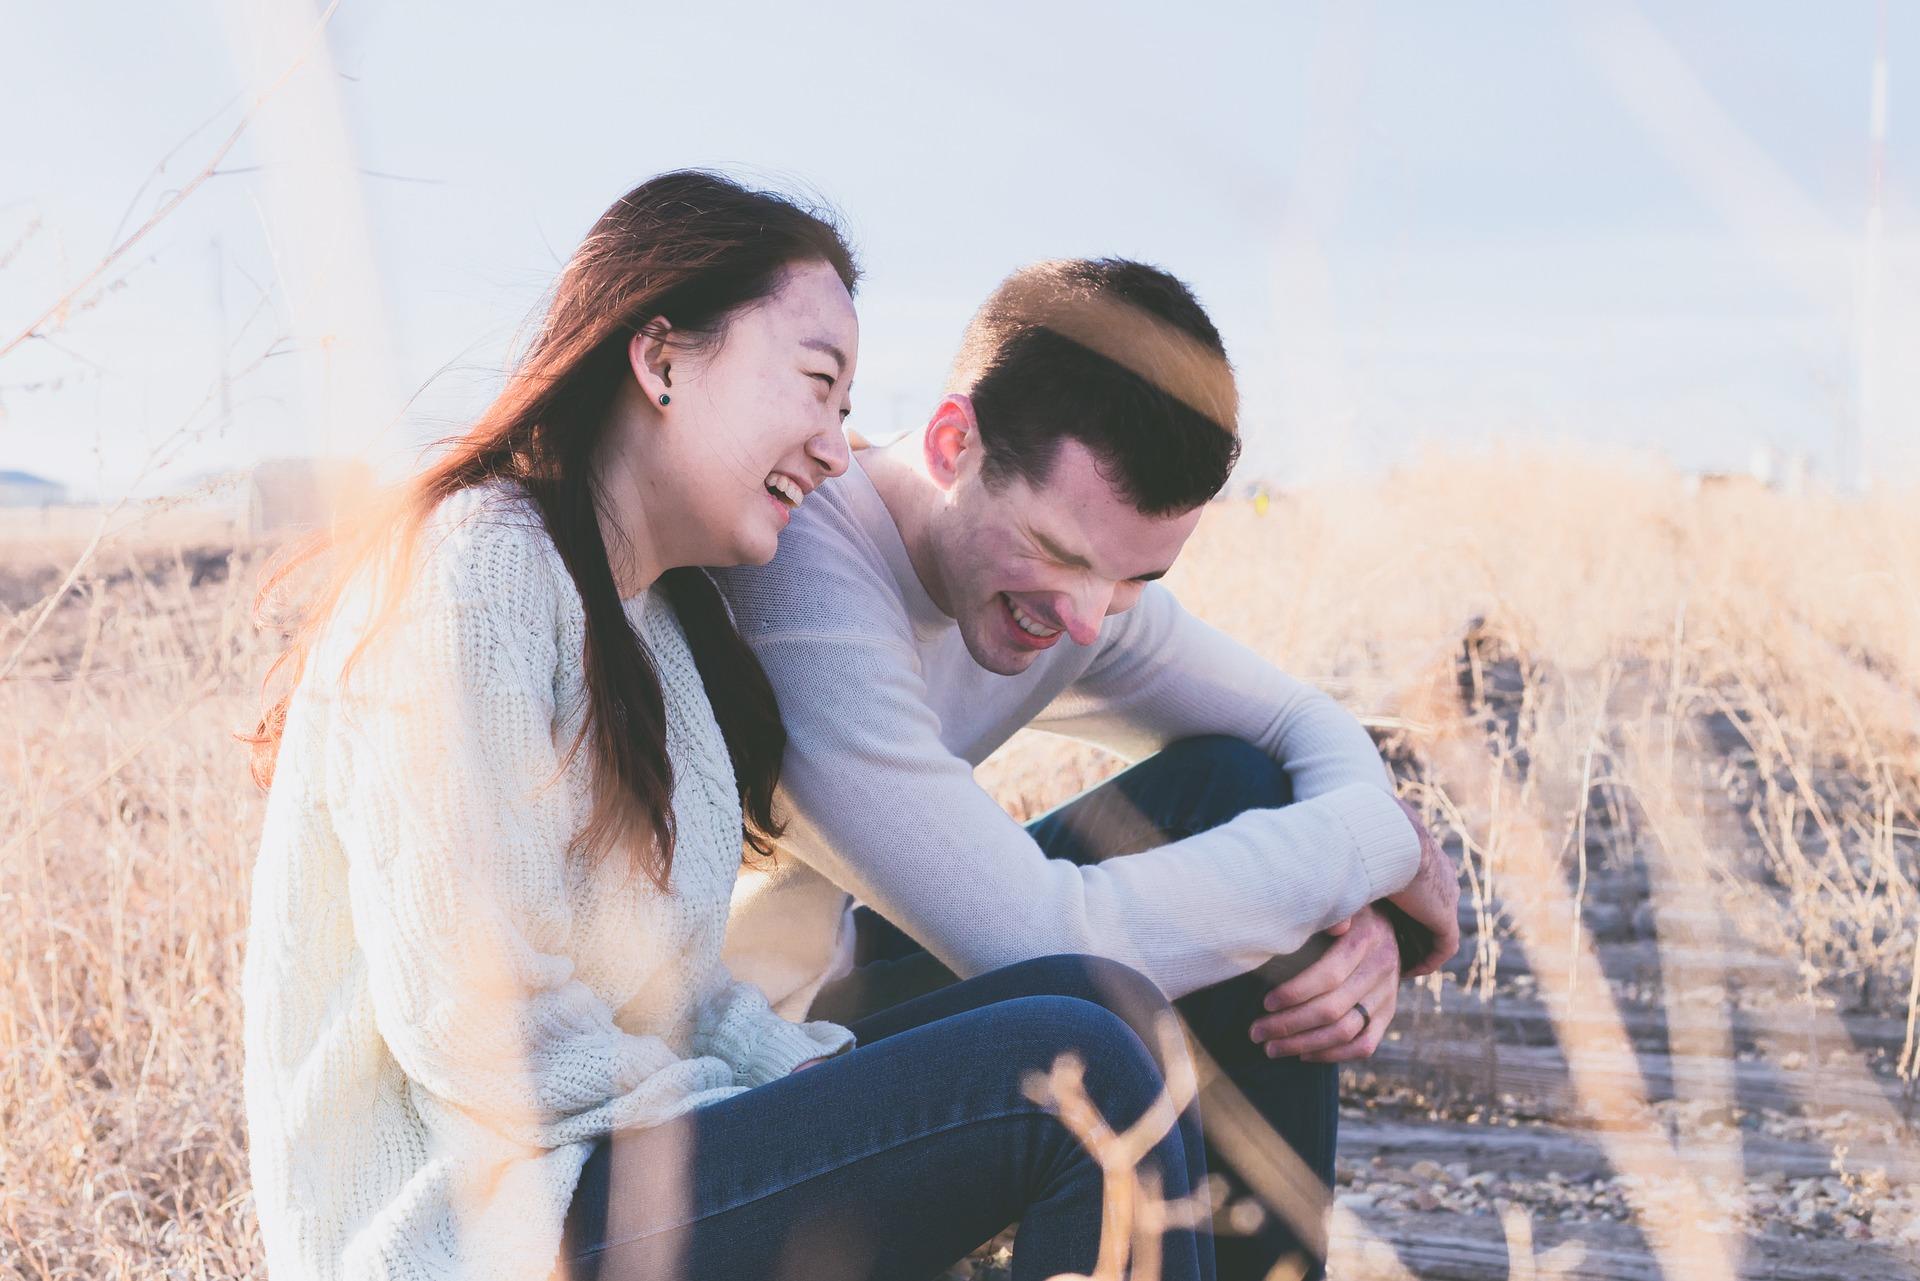 couple-1838940_1920.jpg